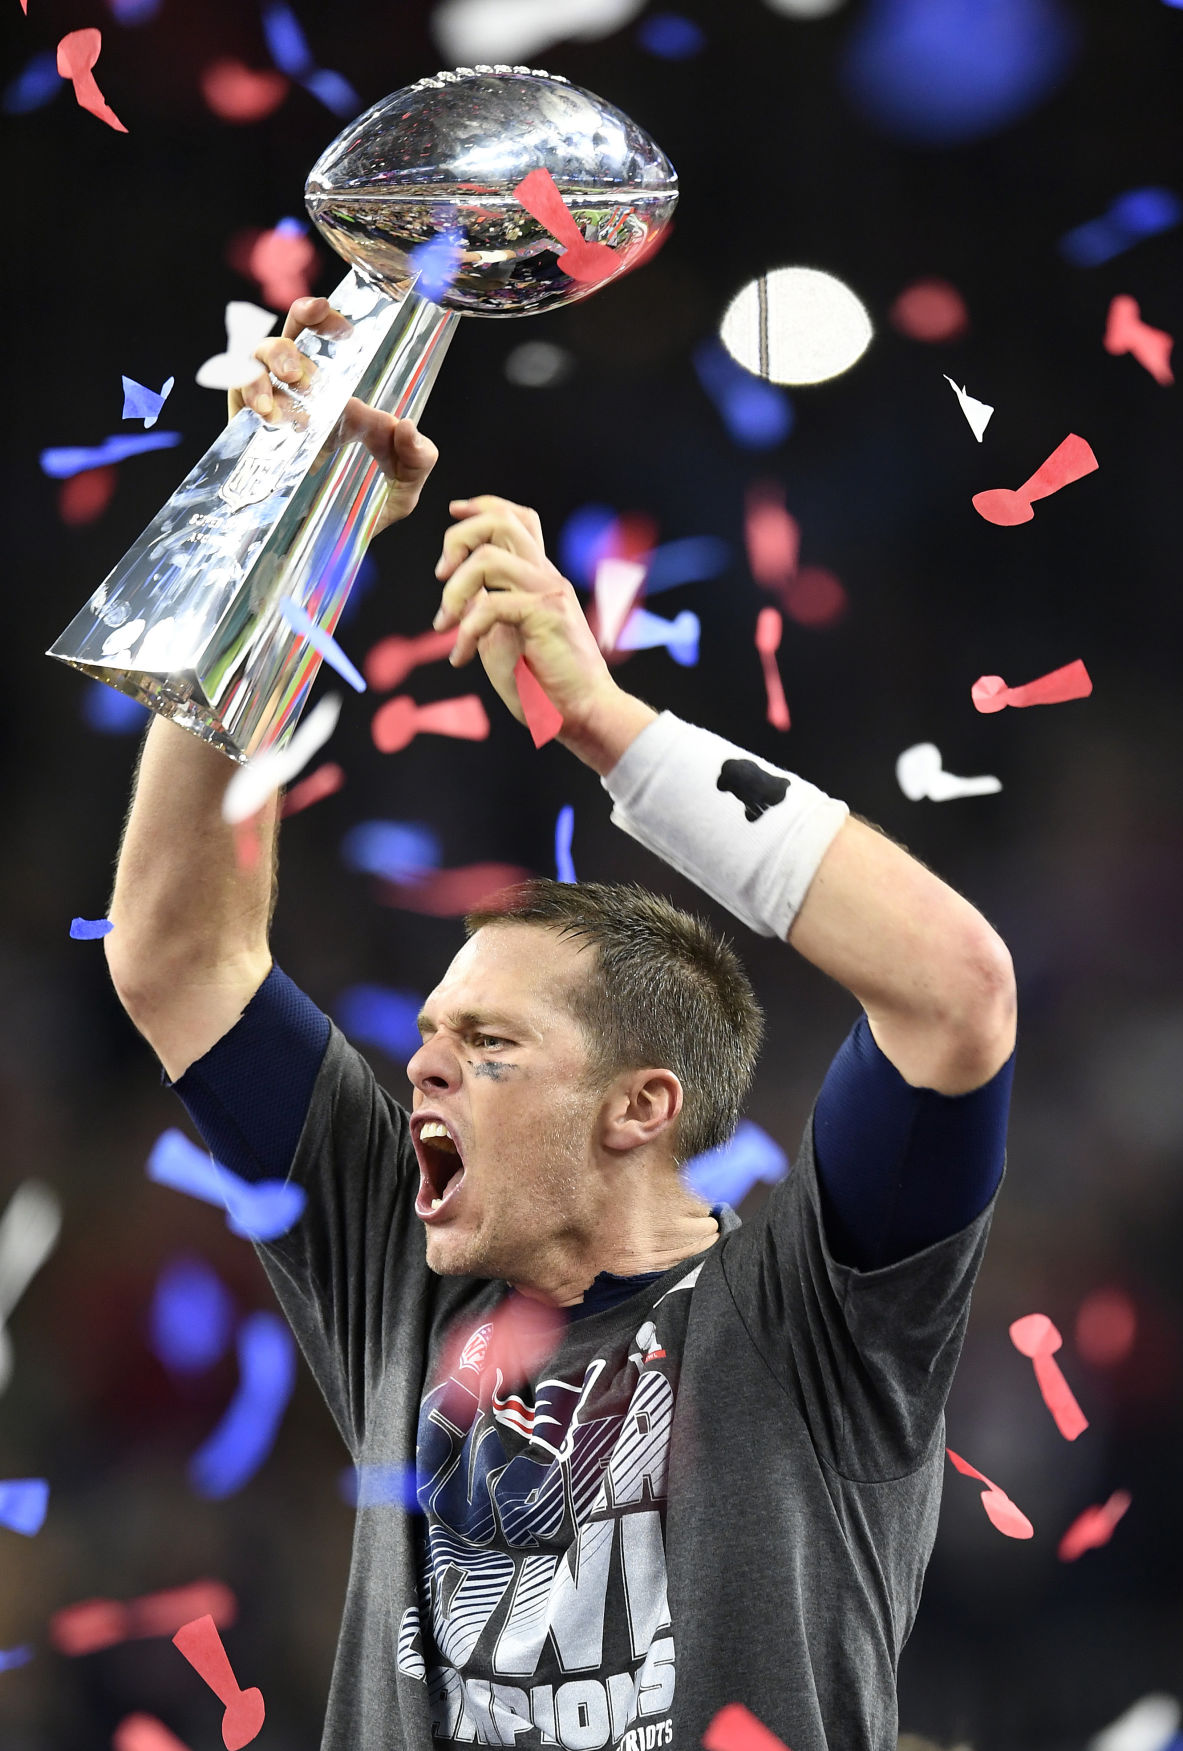 Super Bowl champs again